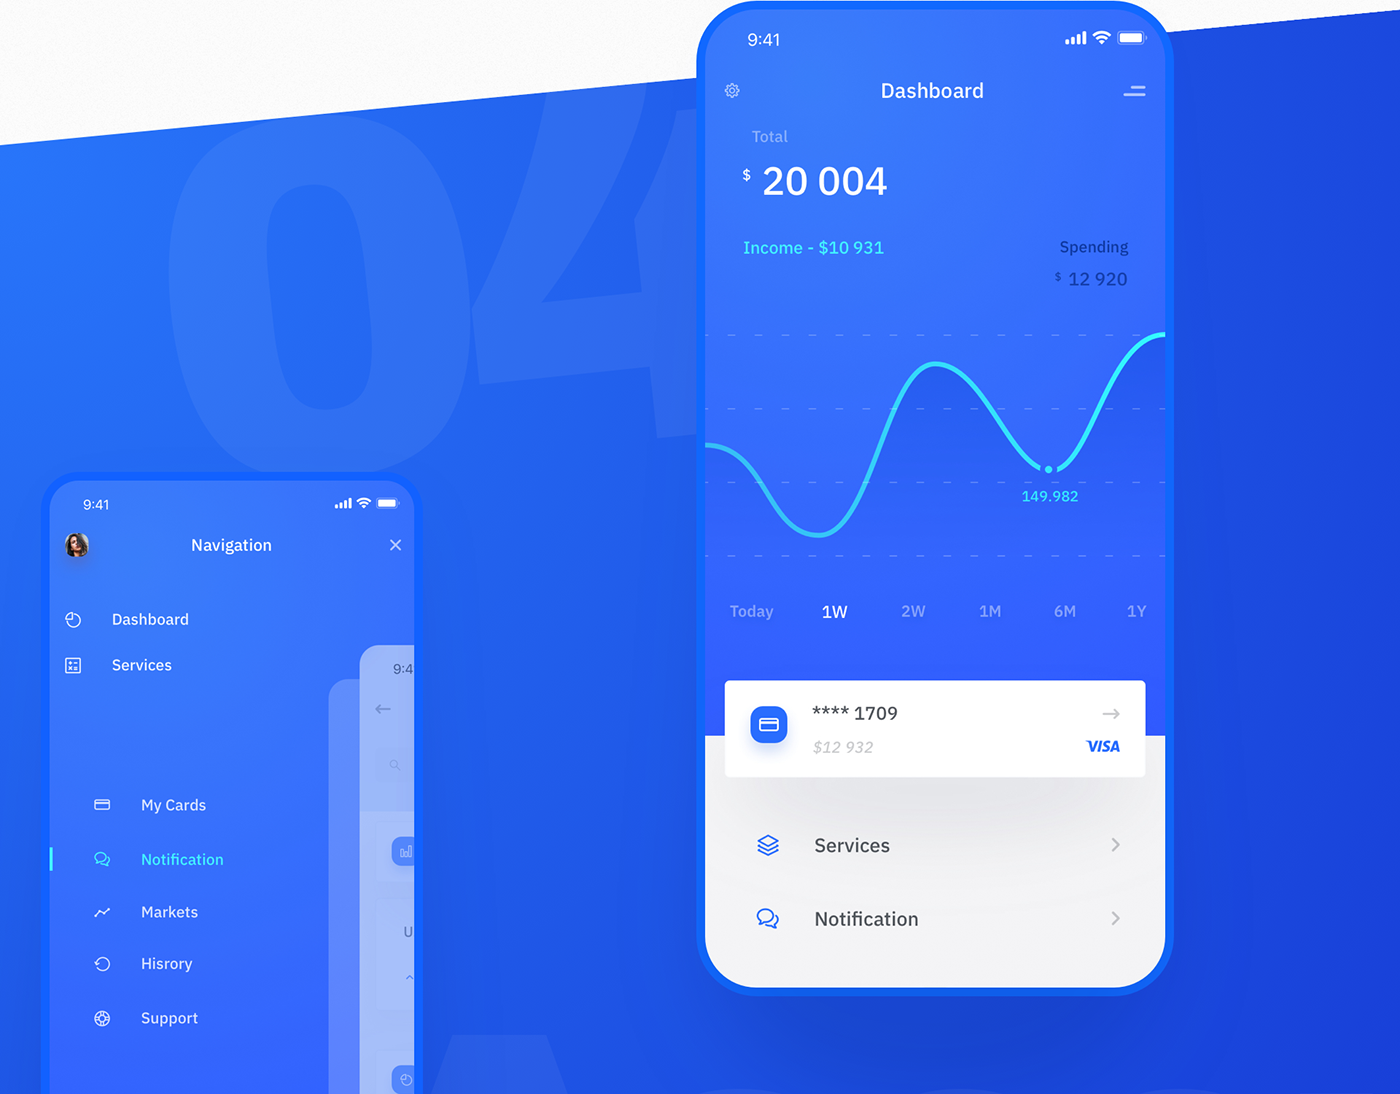 Chase Digital Banking App & Finance, Trade on Behance